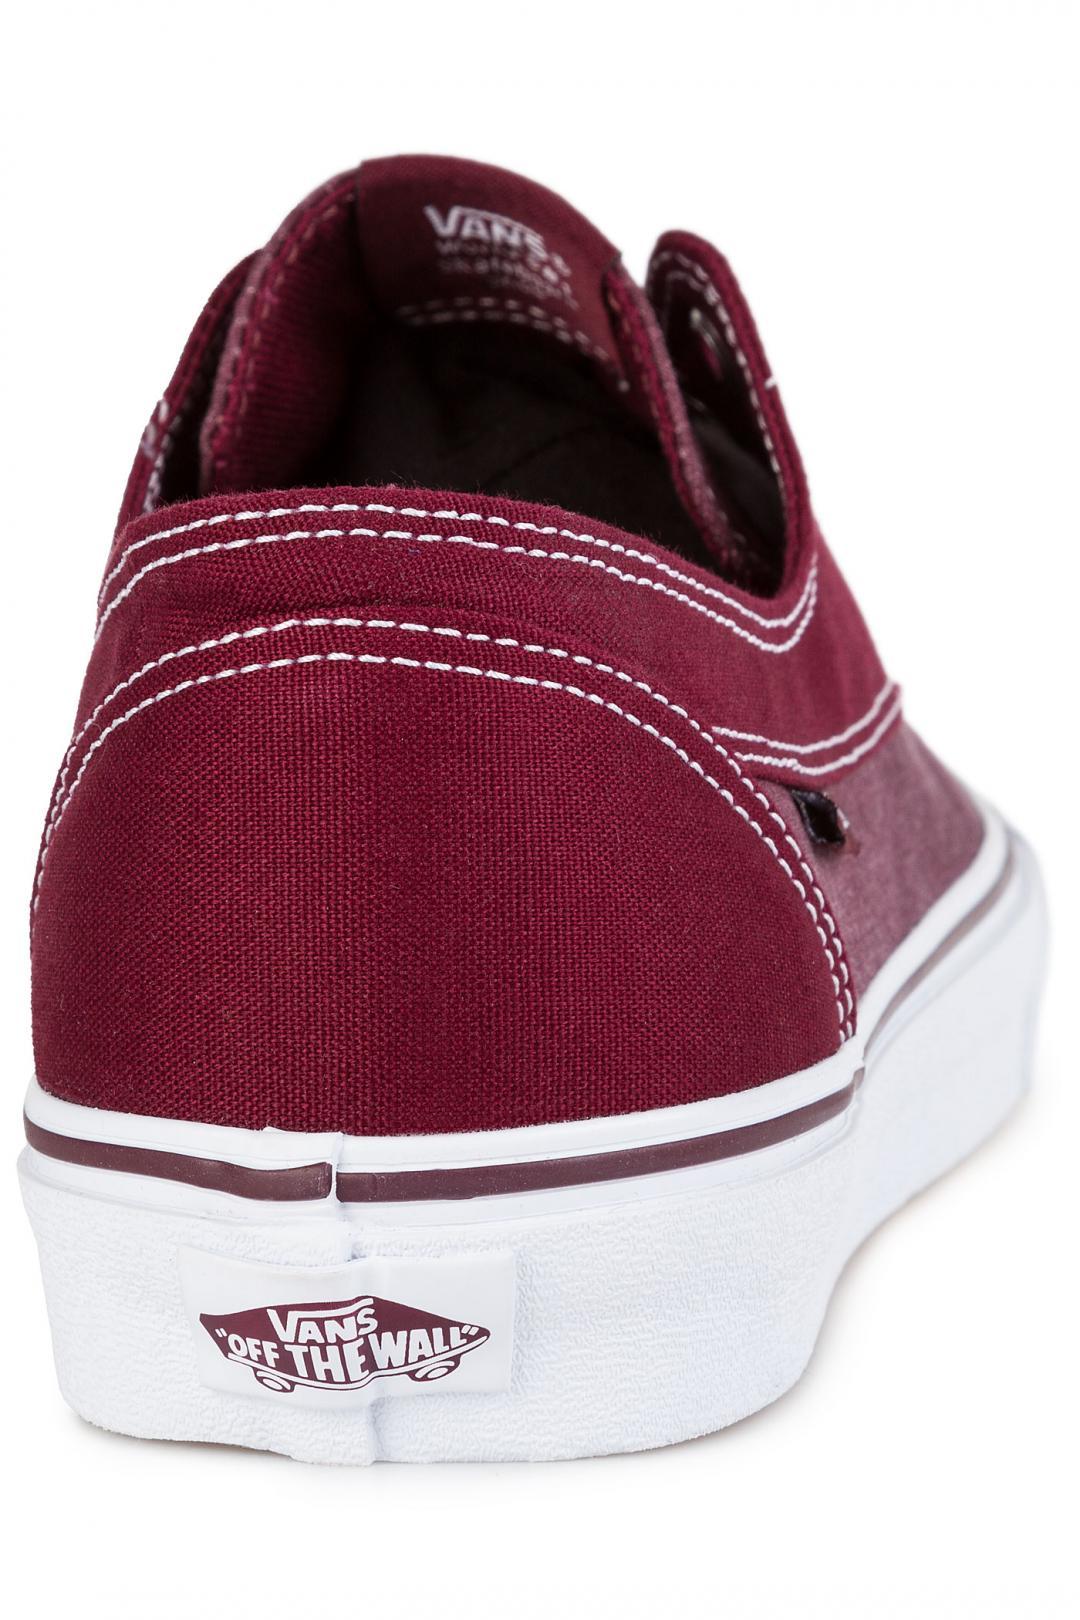 Uomo Vans Brigata Canvas port royale white | Sneakers low top